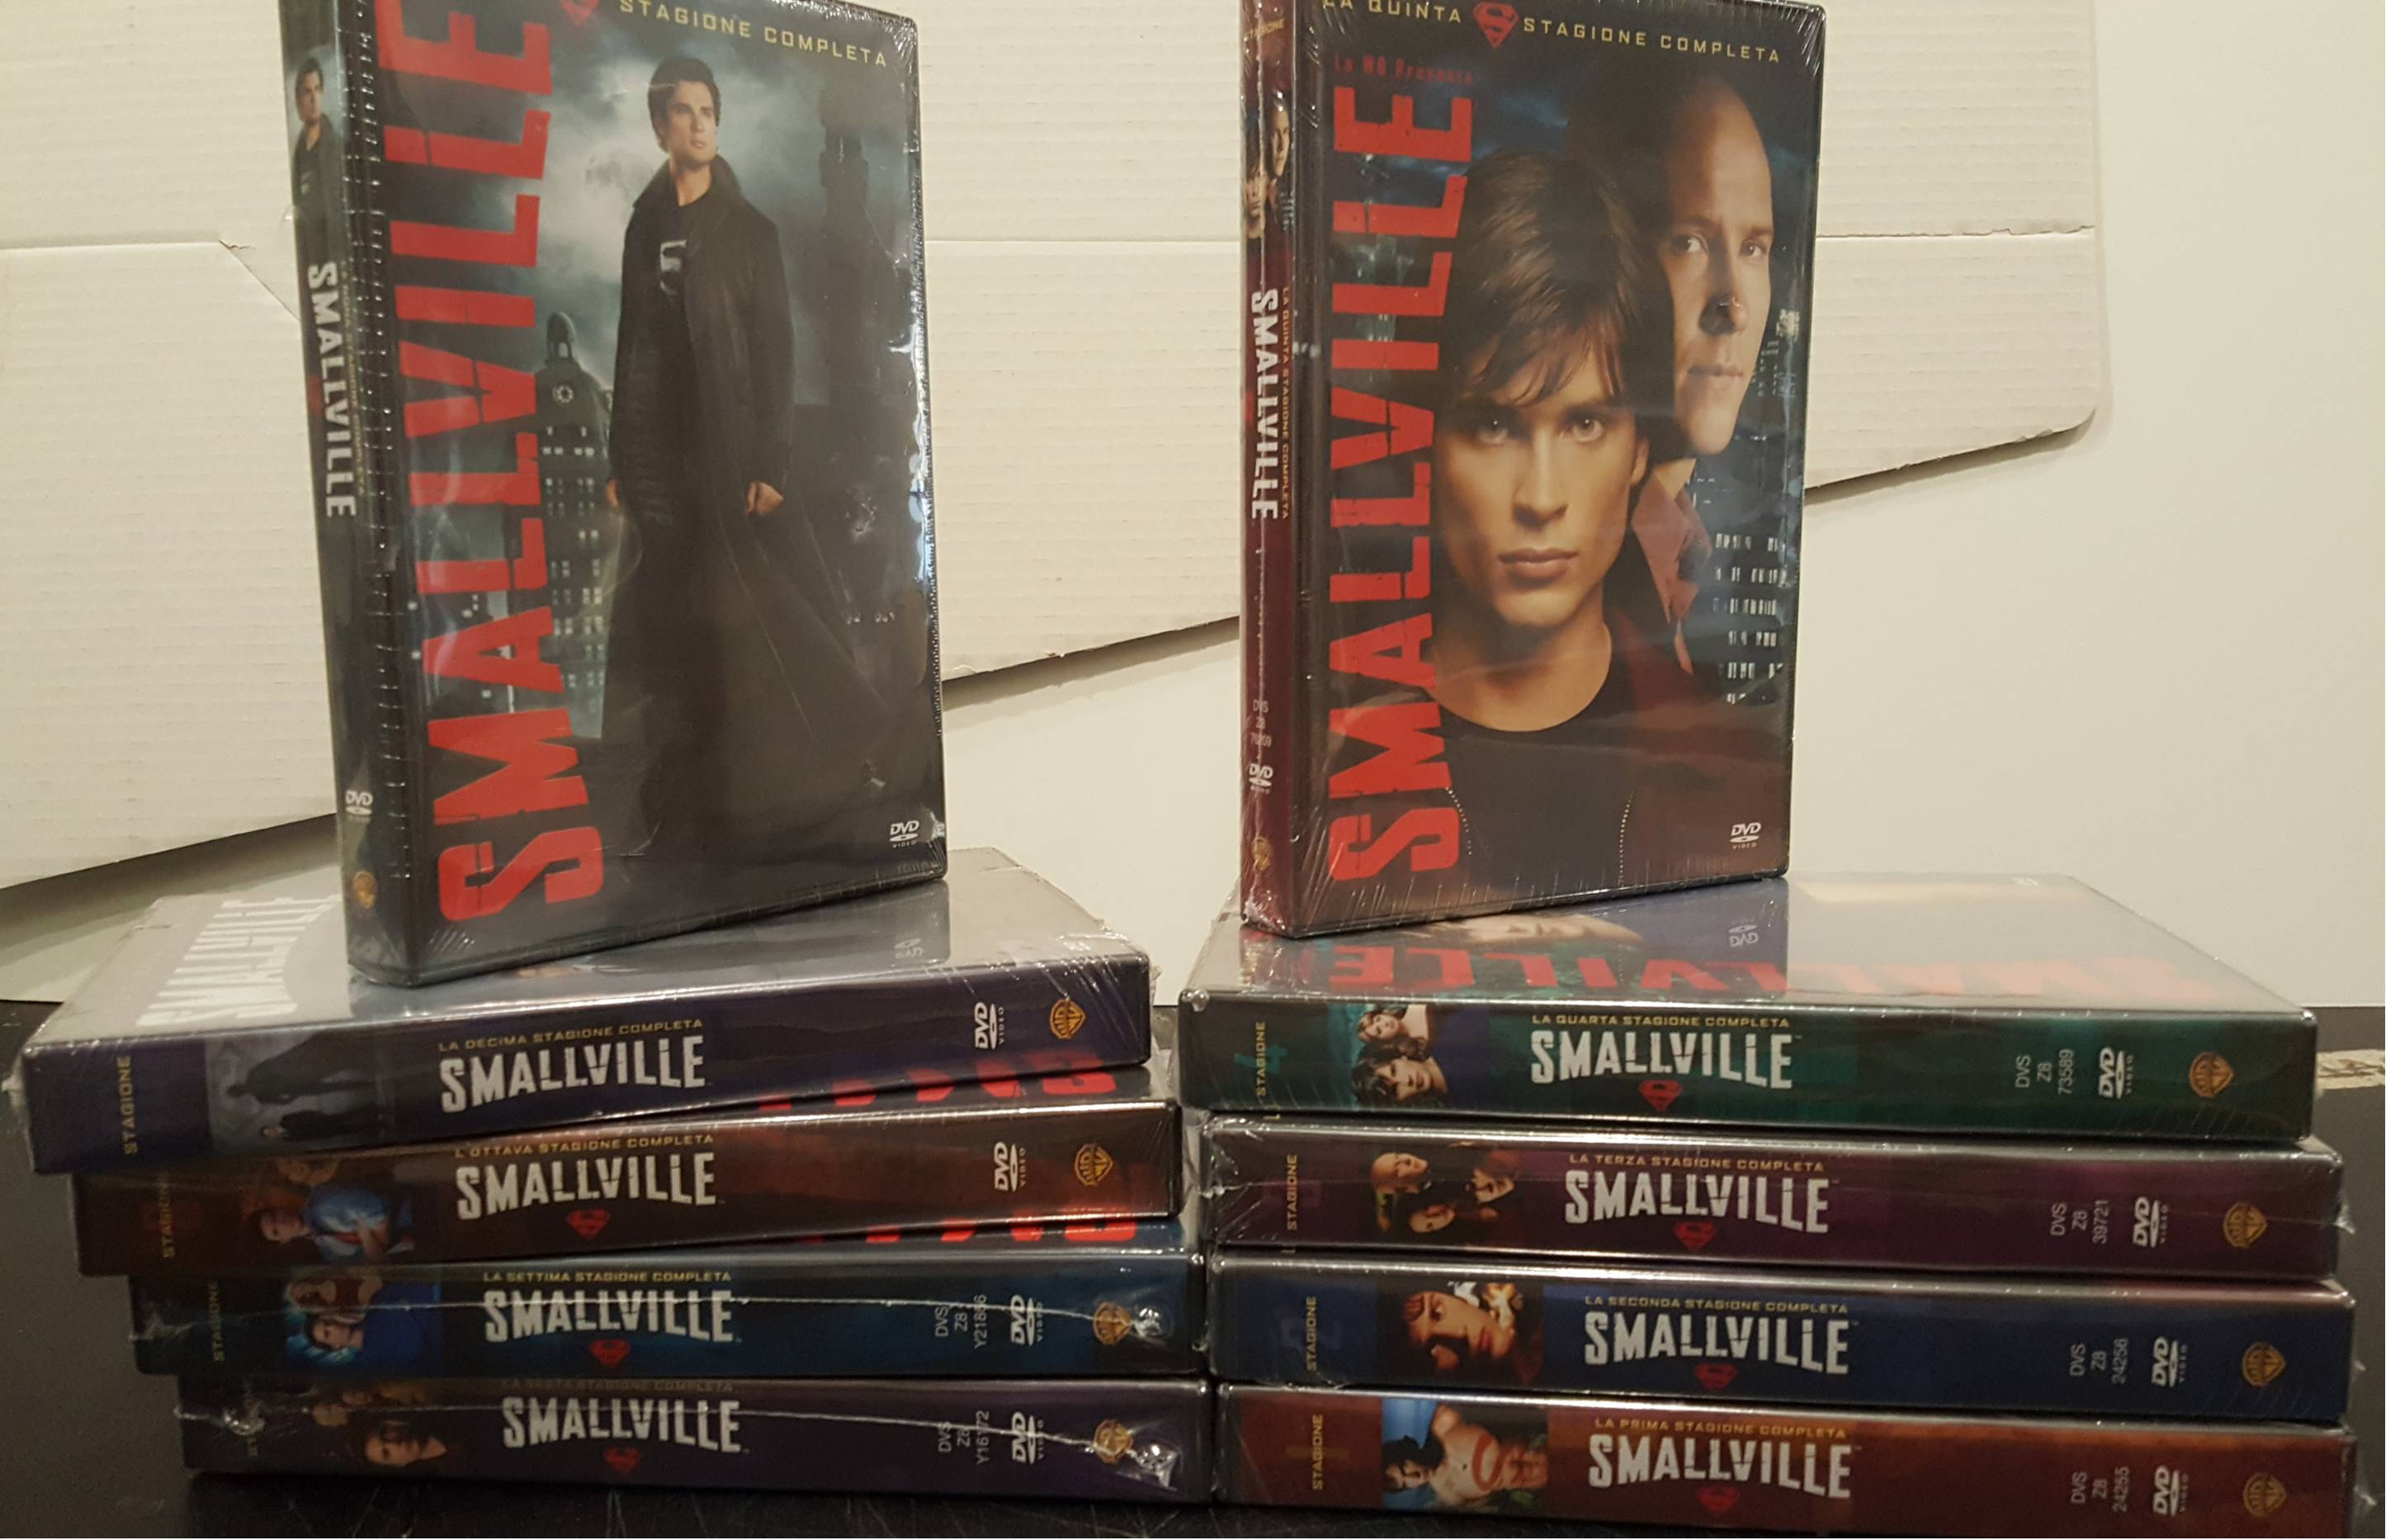 COF.SMALLVILLE - STAG.01-10 SERIE COMP. (60 DVD) (DVD)